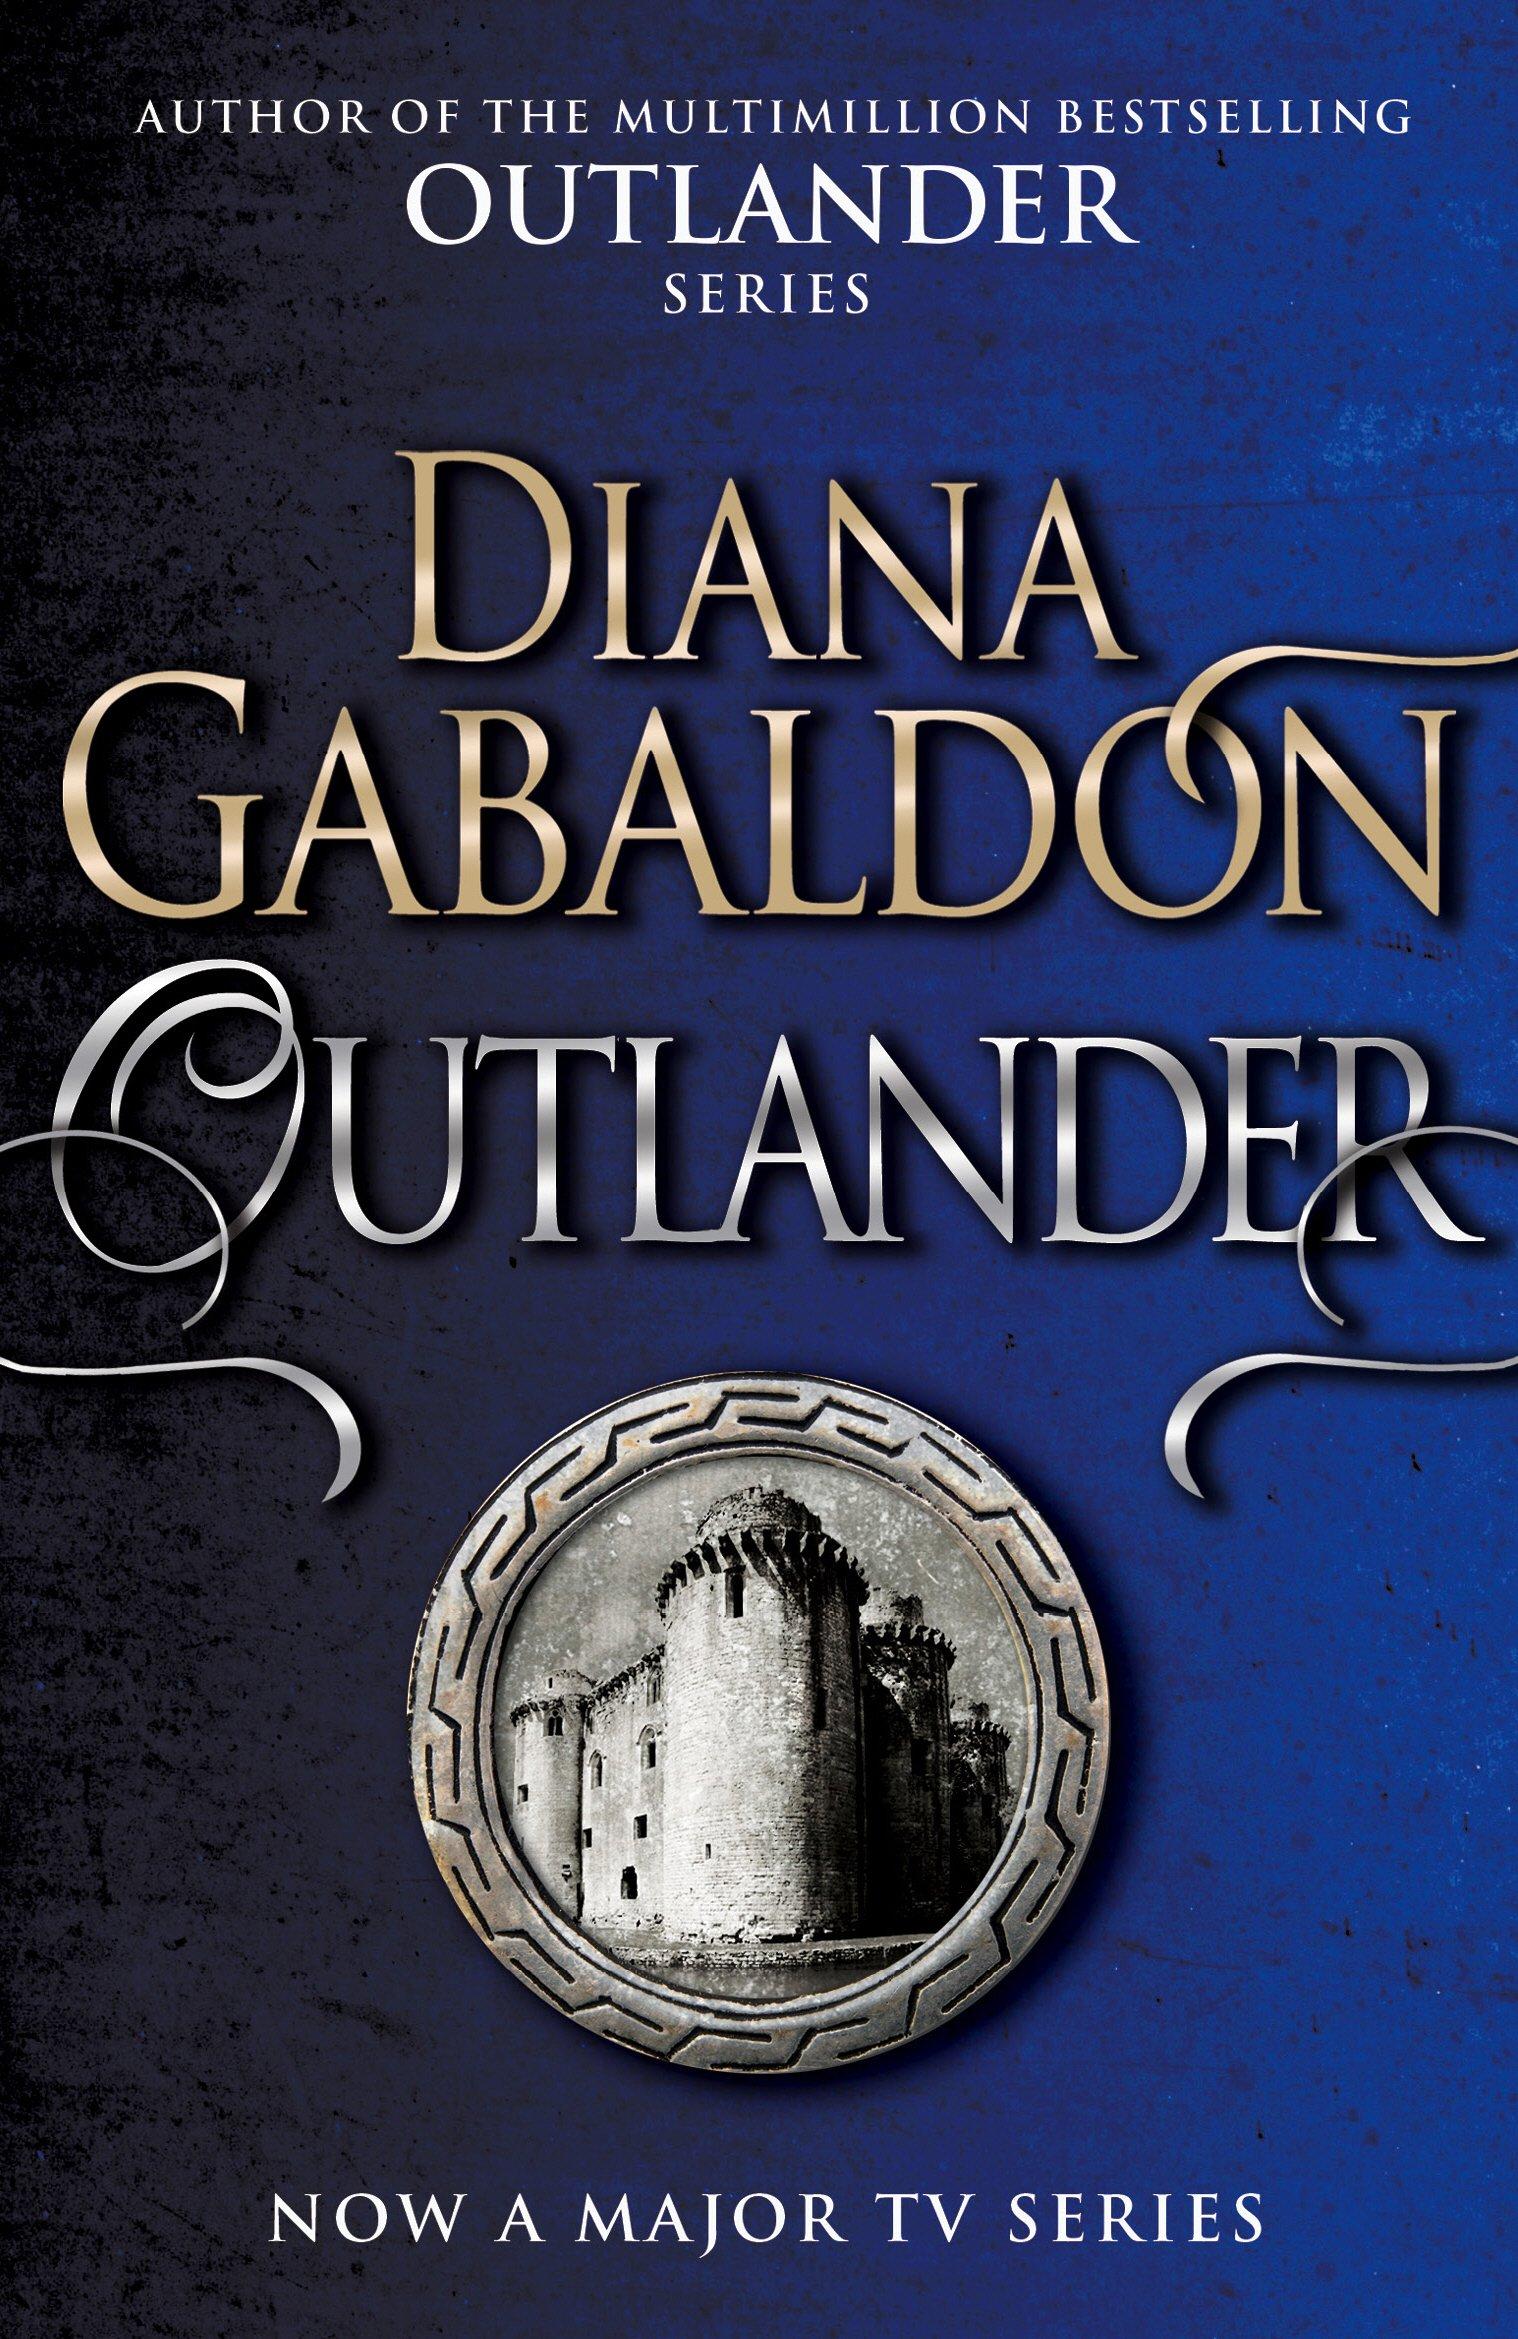 Outlander outlander 1 amazon diana gabaldon outlander outlander 1 amazon diana gabaldon 9781784751371 books fandeluxe Images